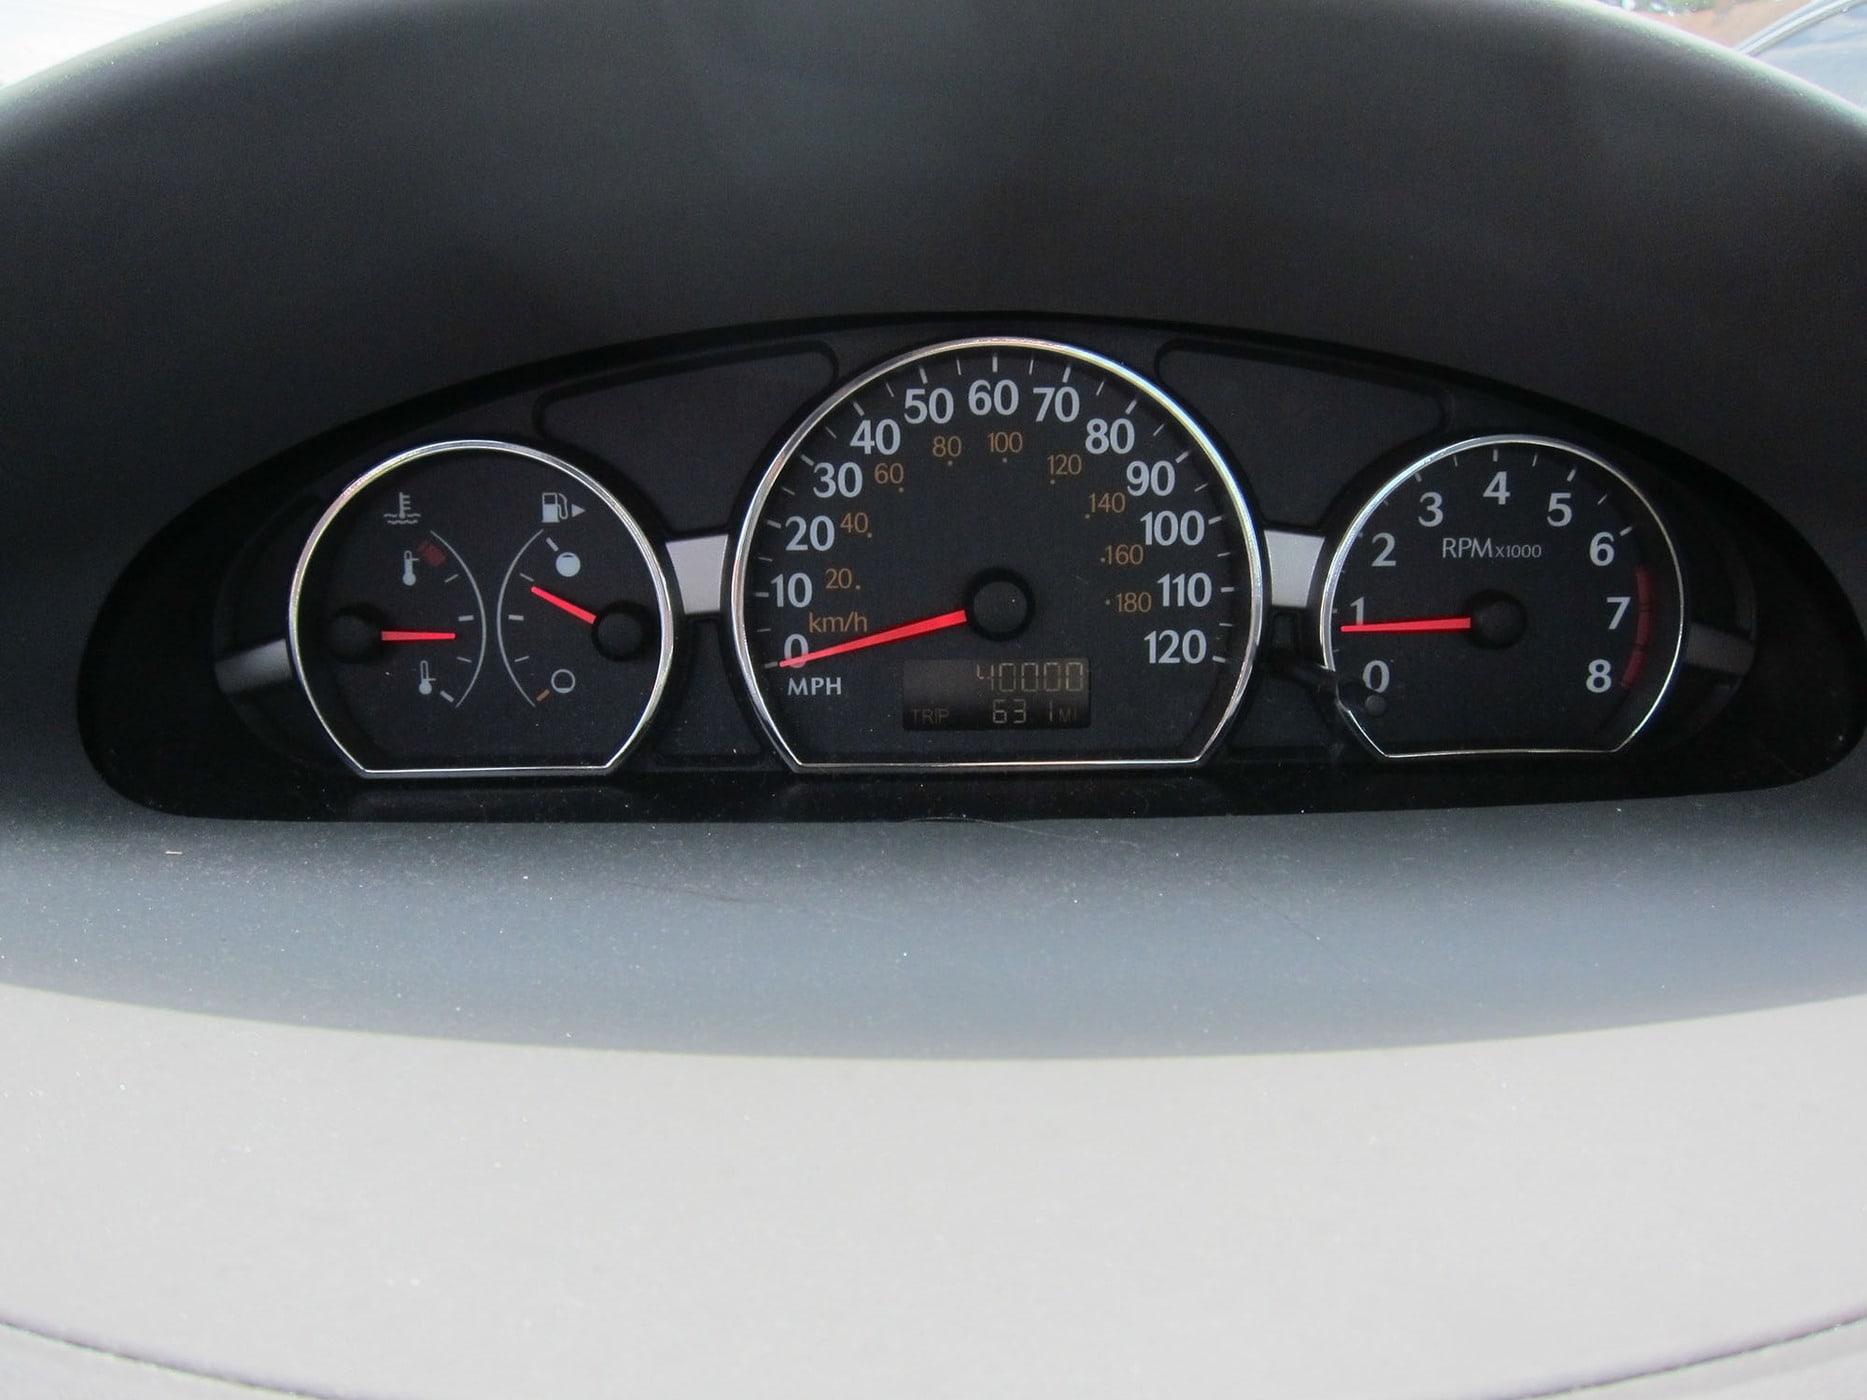 Reaching 40,000 miles on my car.